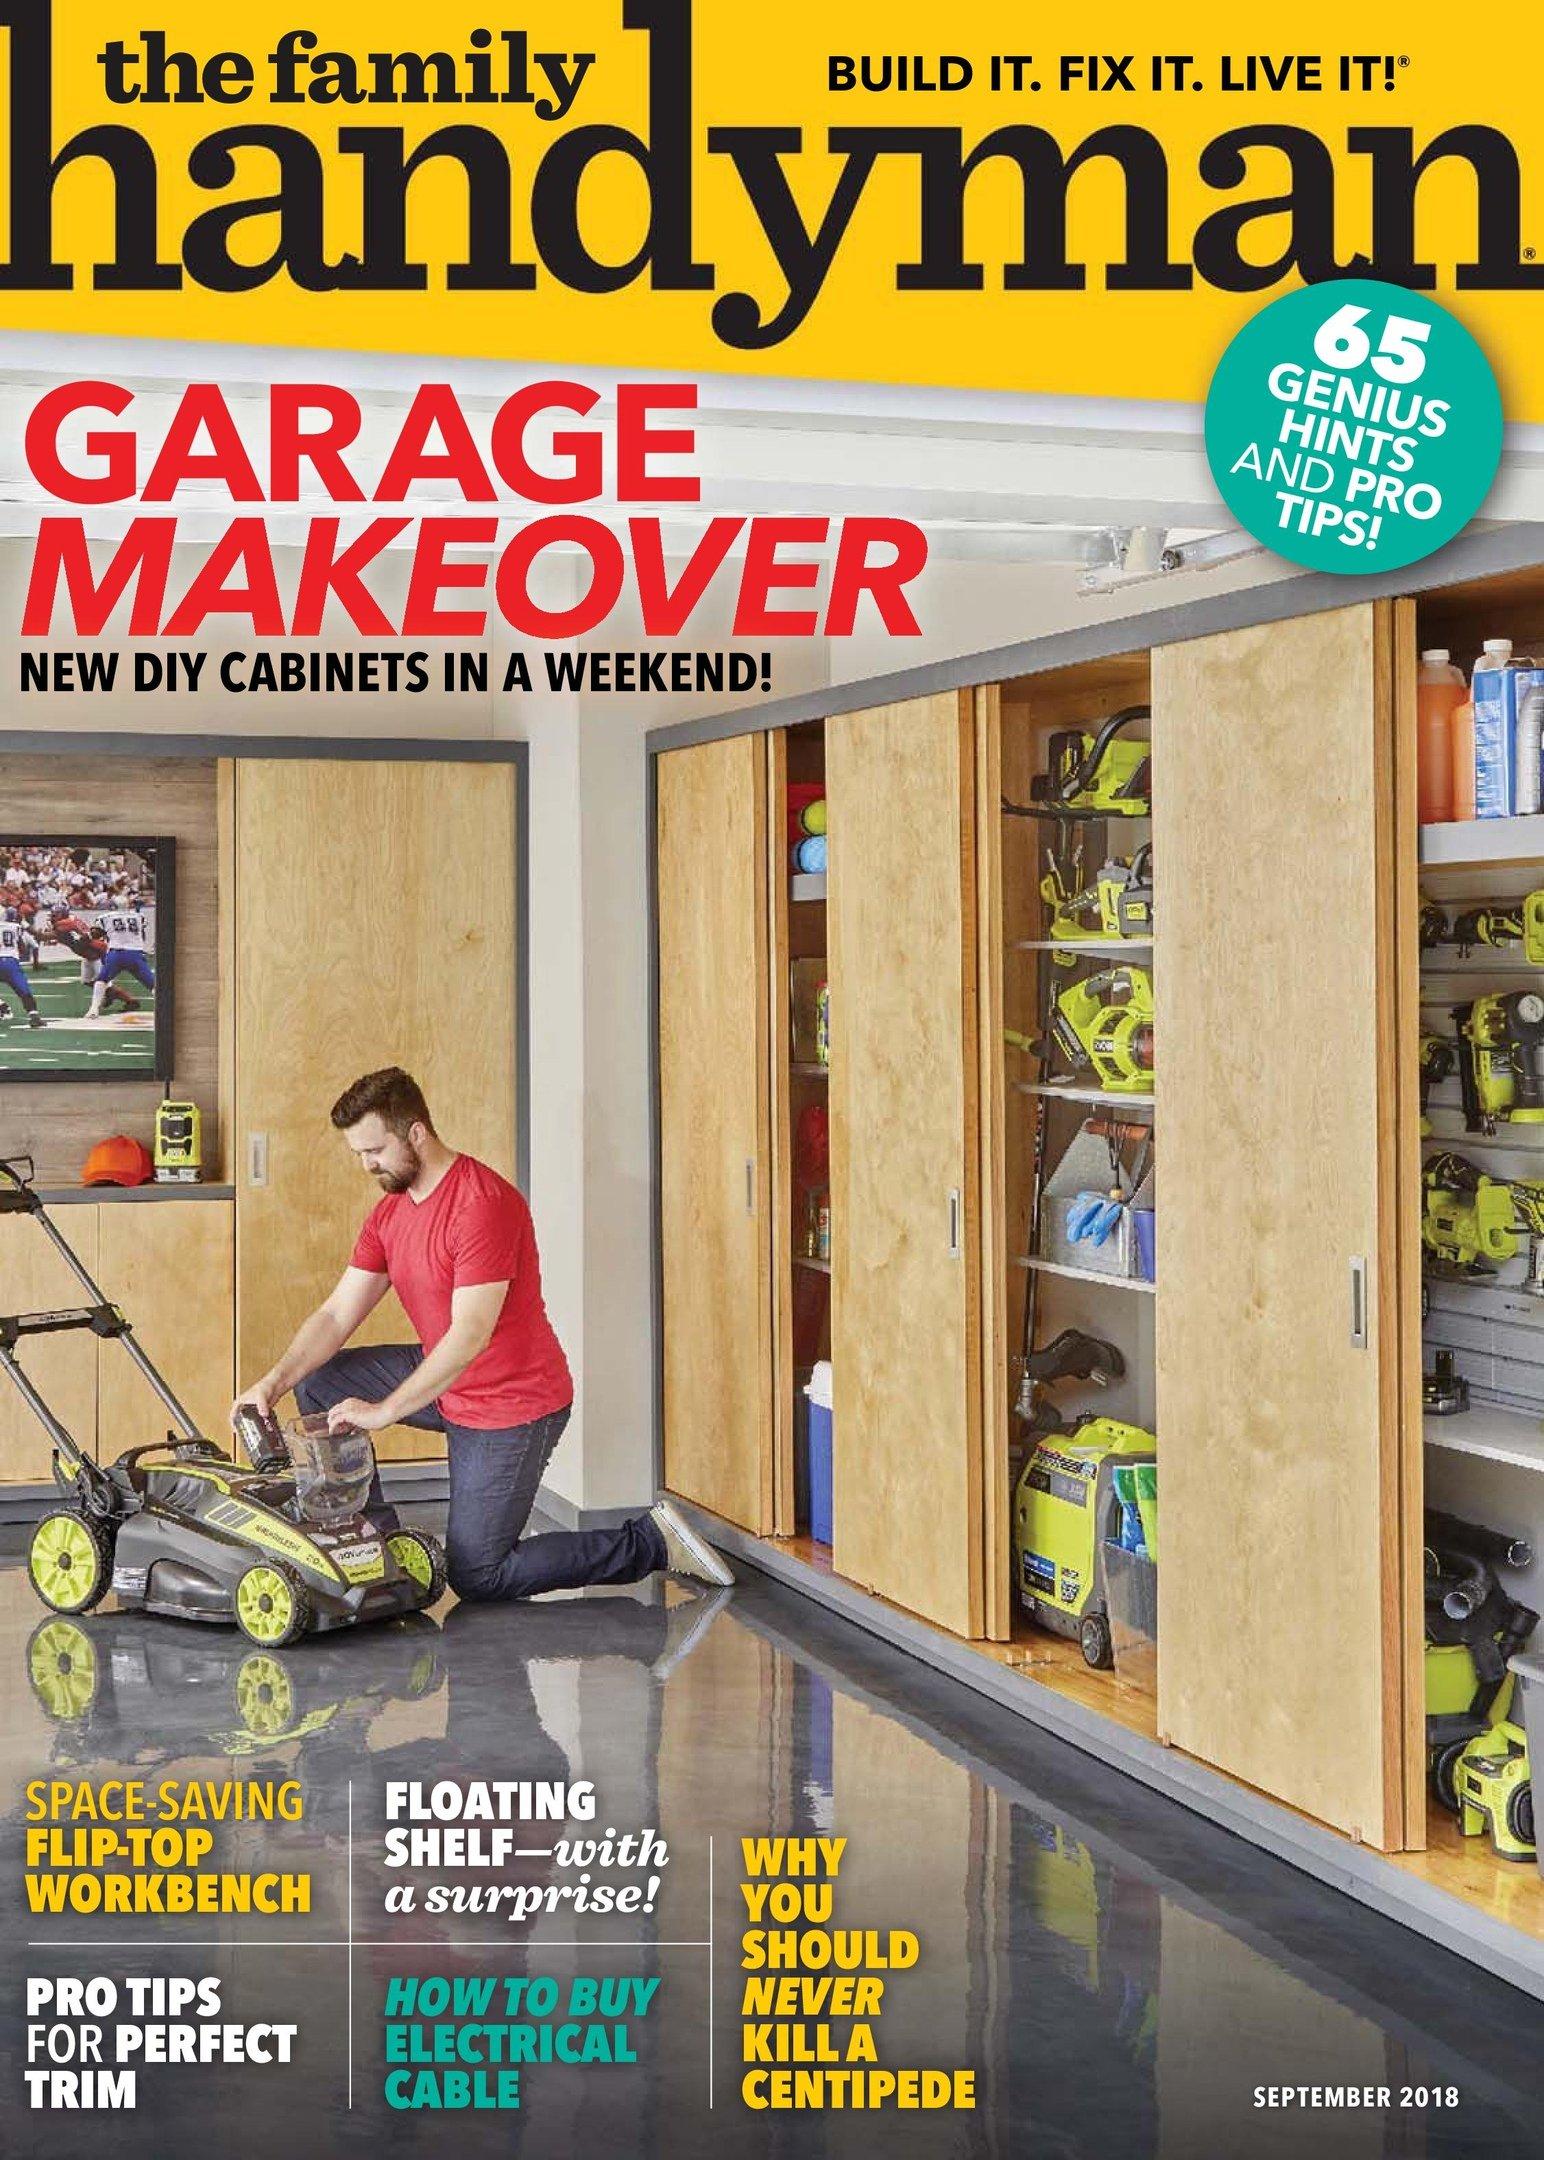 The family handyman september 2018 pdf download free for The family handyman pdf